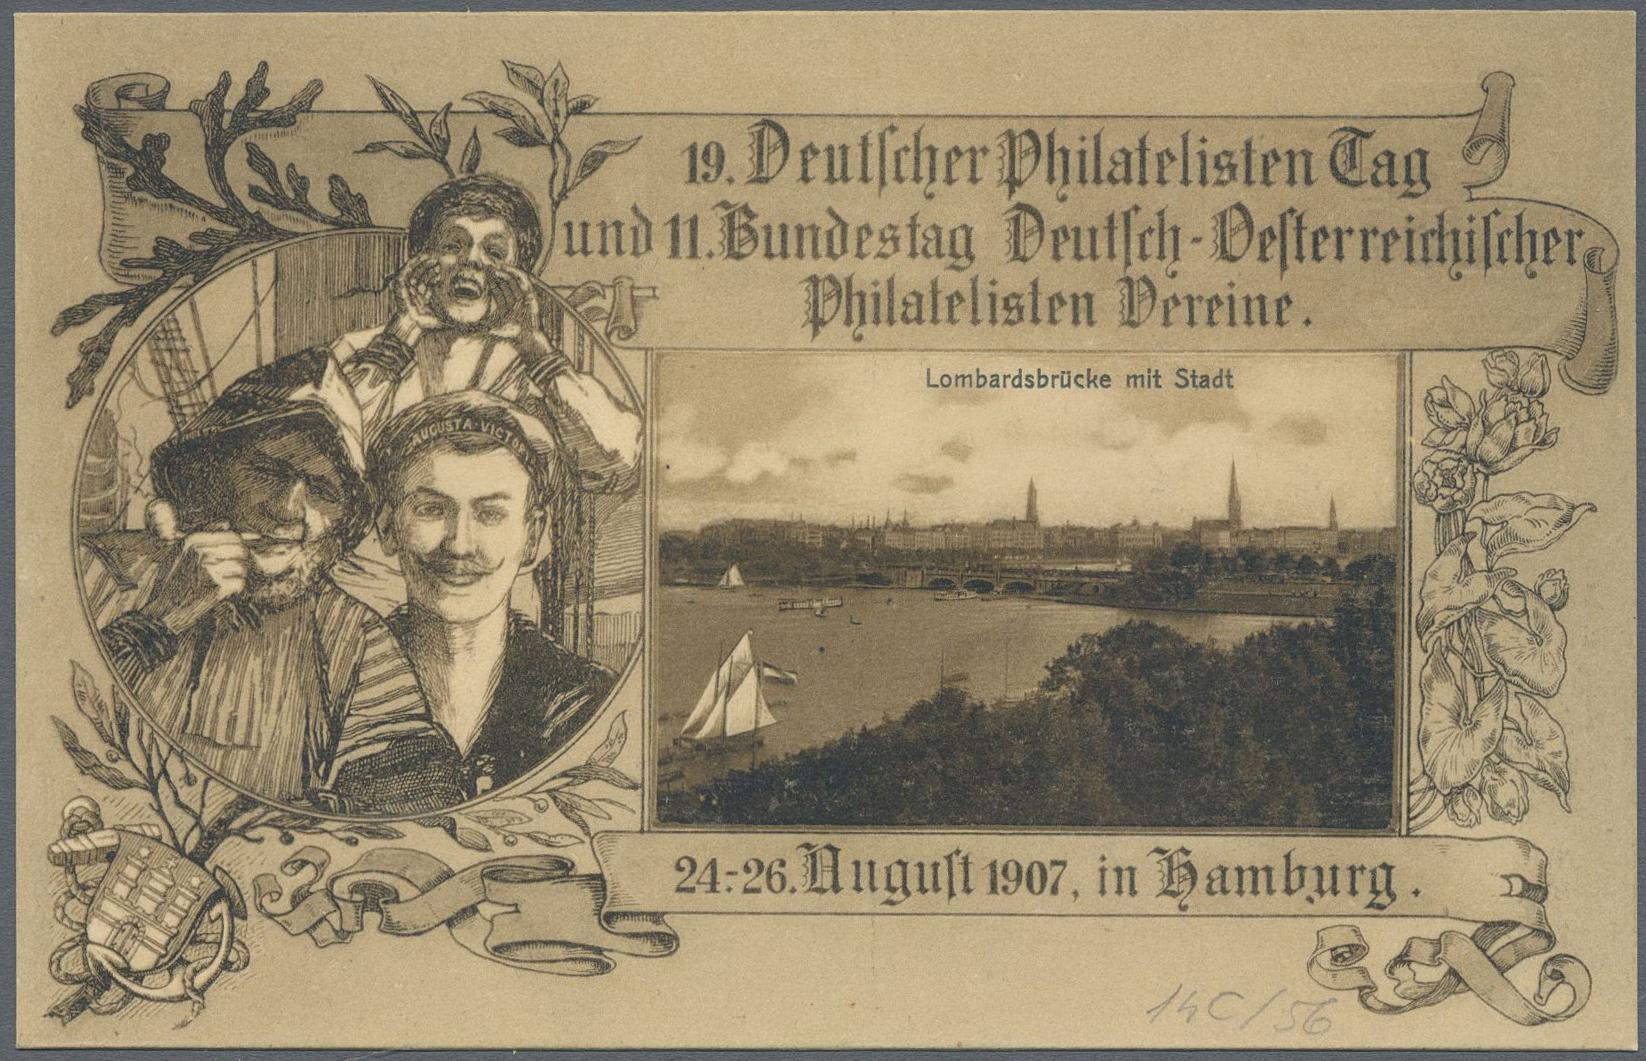 Lot 37138 - Deutsches Reich - Privatganzsachen  -  Auktionshaus Christoph Gärtner GmbH & Co. KG Collections Germany,  Collections Supplement, Surprise boxes #39 Day 7